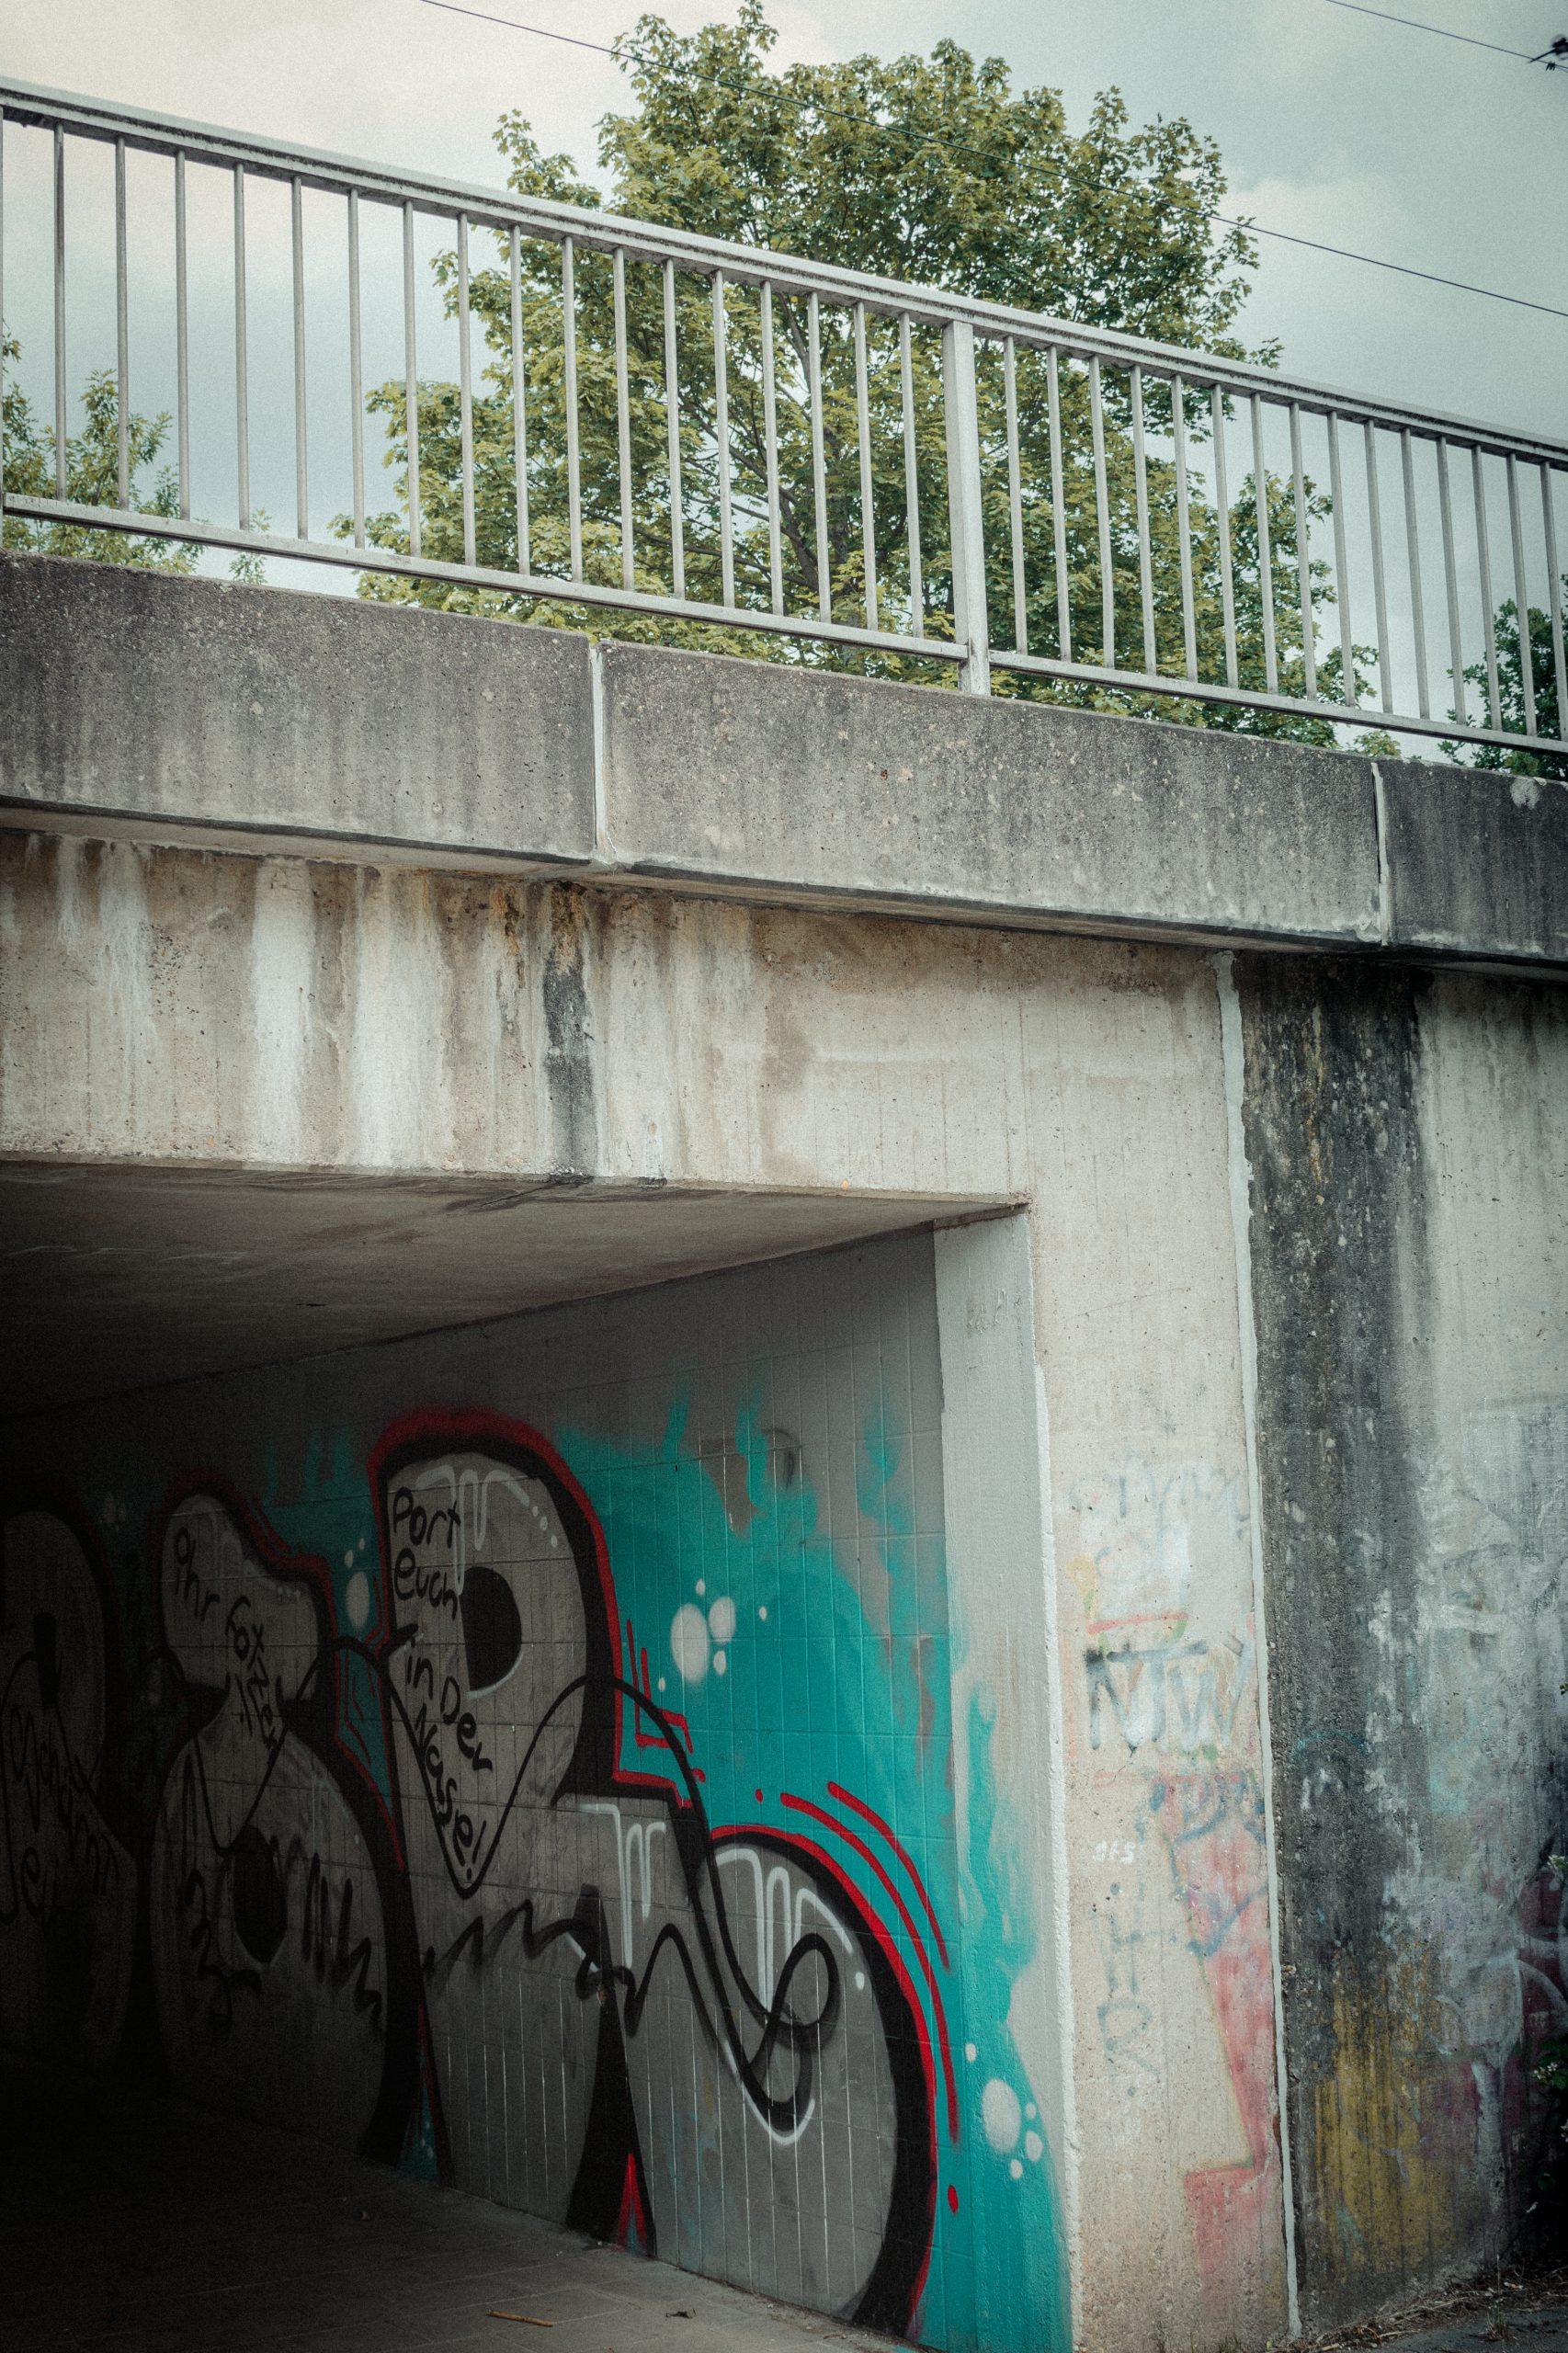 Bedrohlicher Bahnhofsweg in Köln